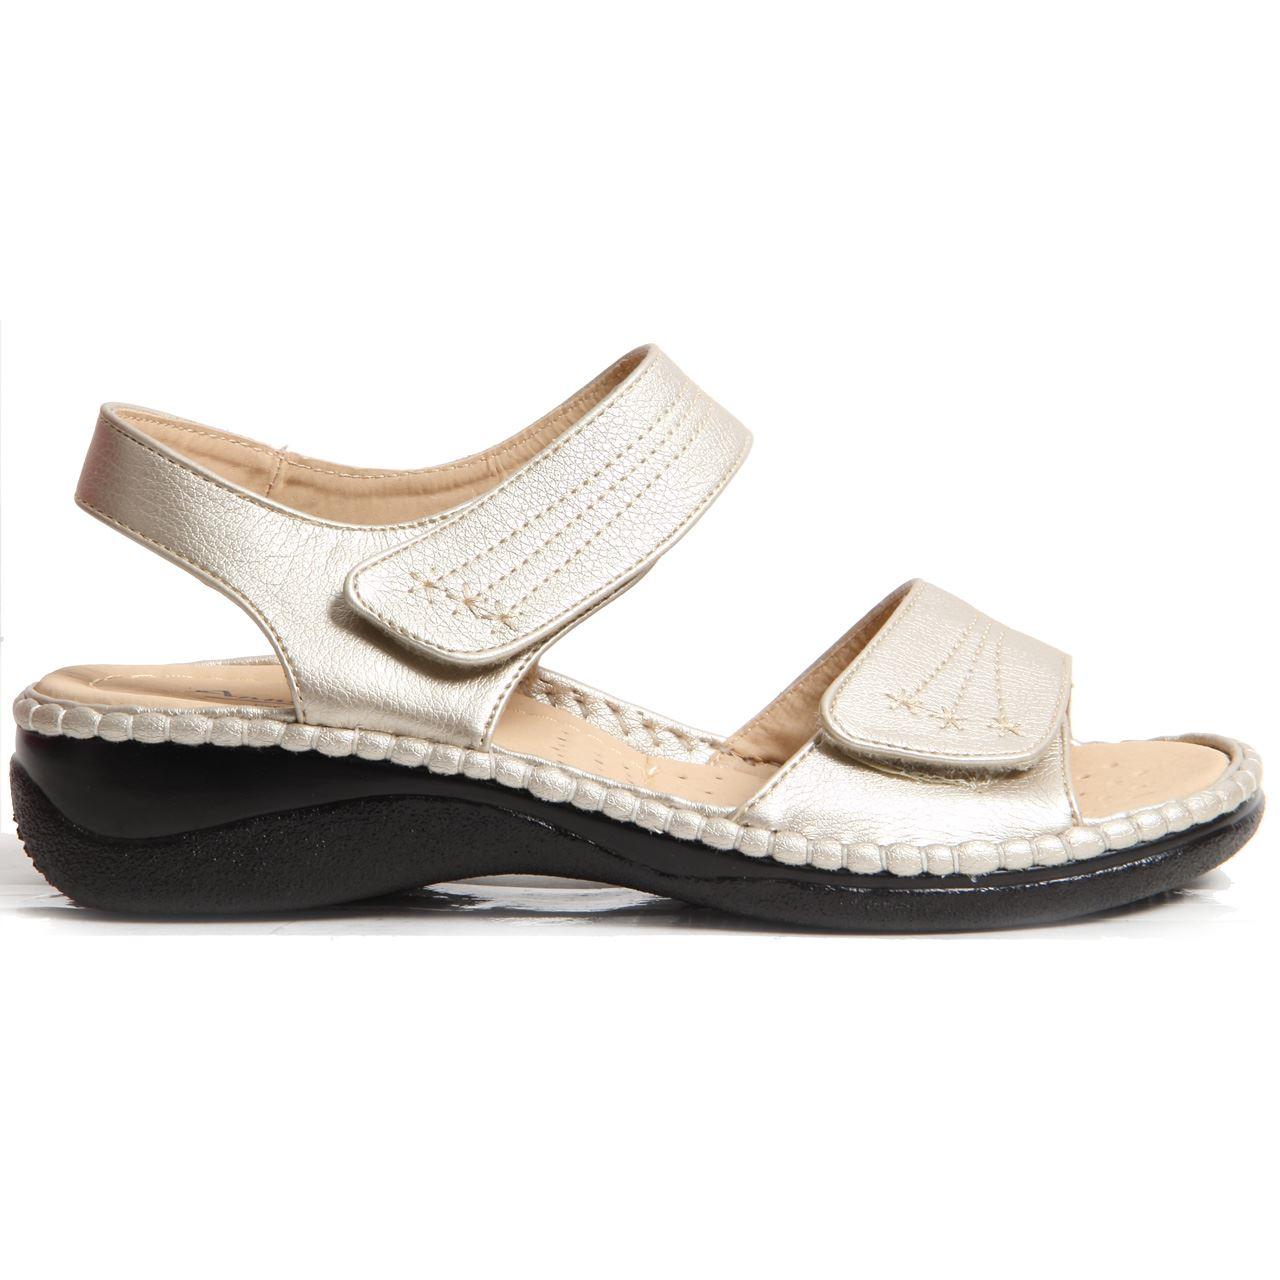 comfortable summer sandals - 28 images